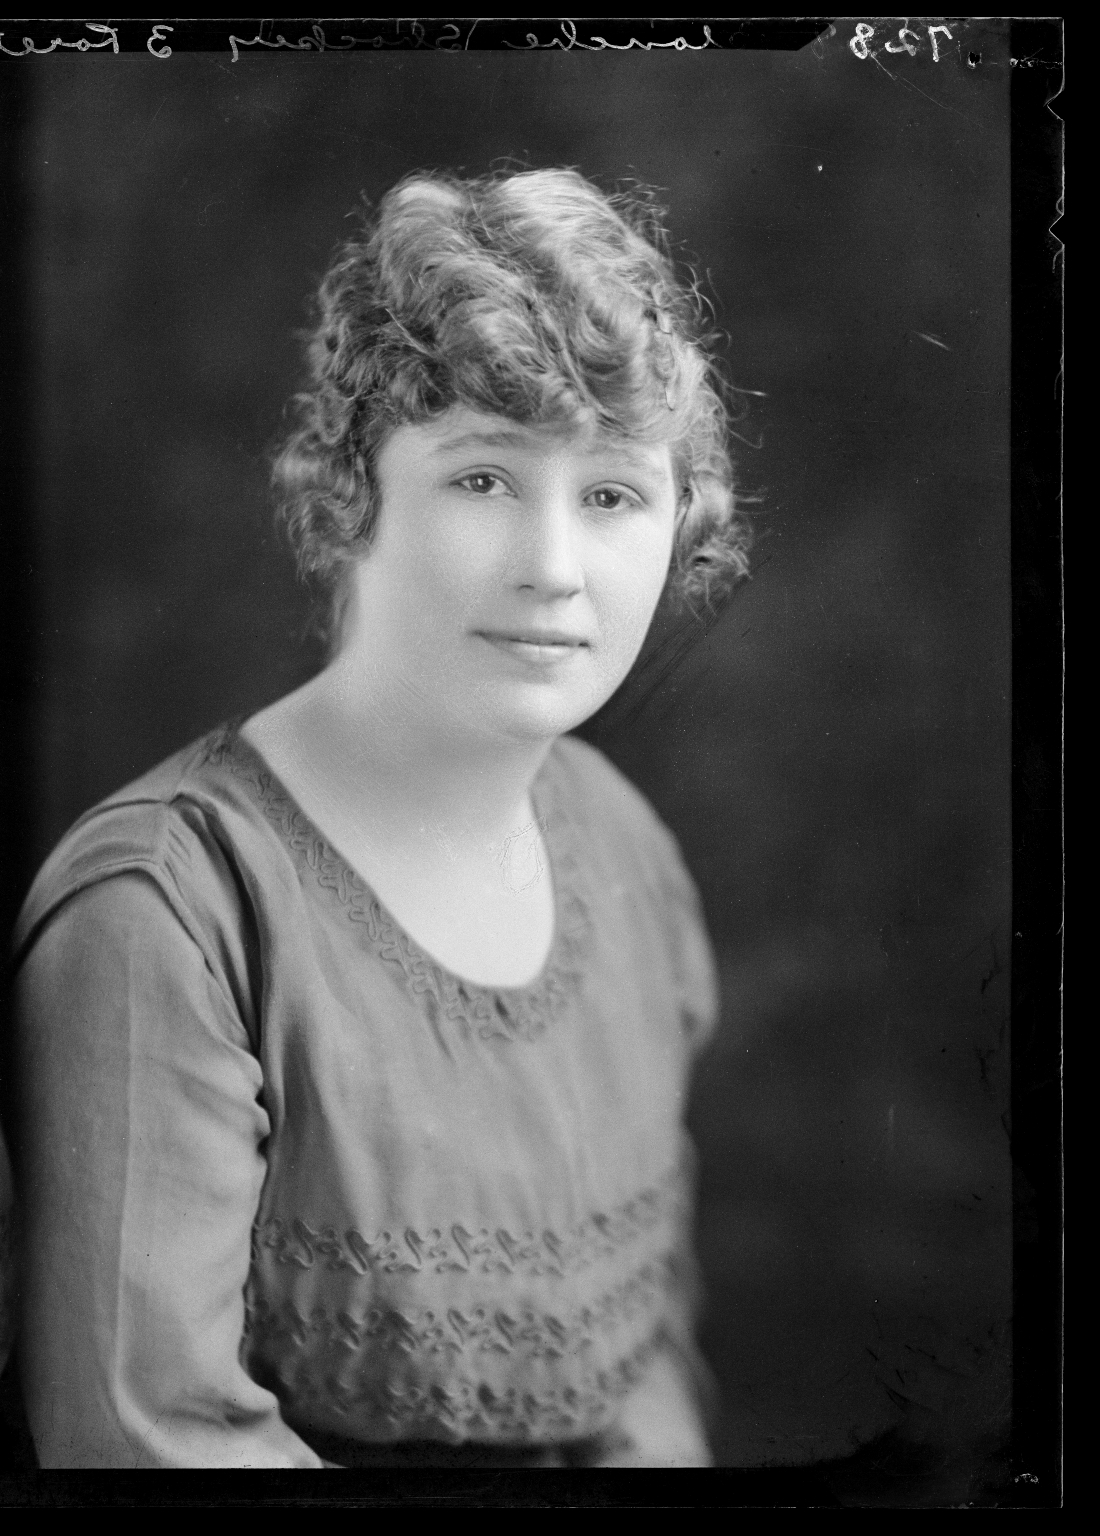 Portraits of Miss Blanche Shockey